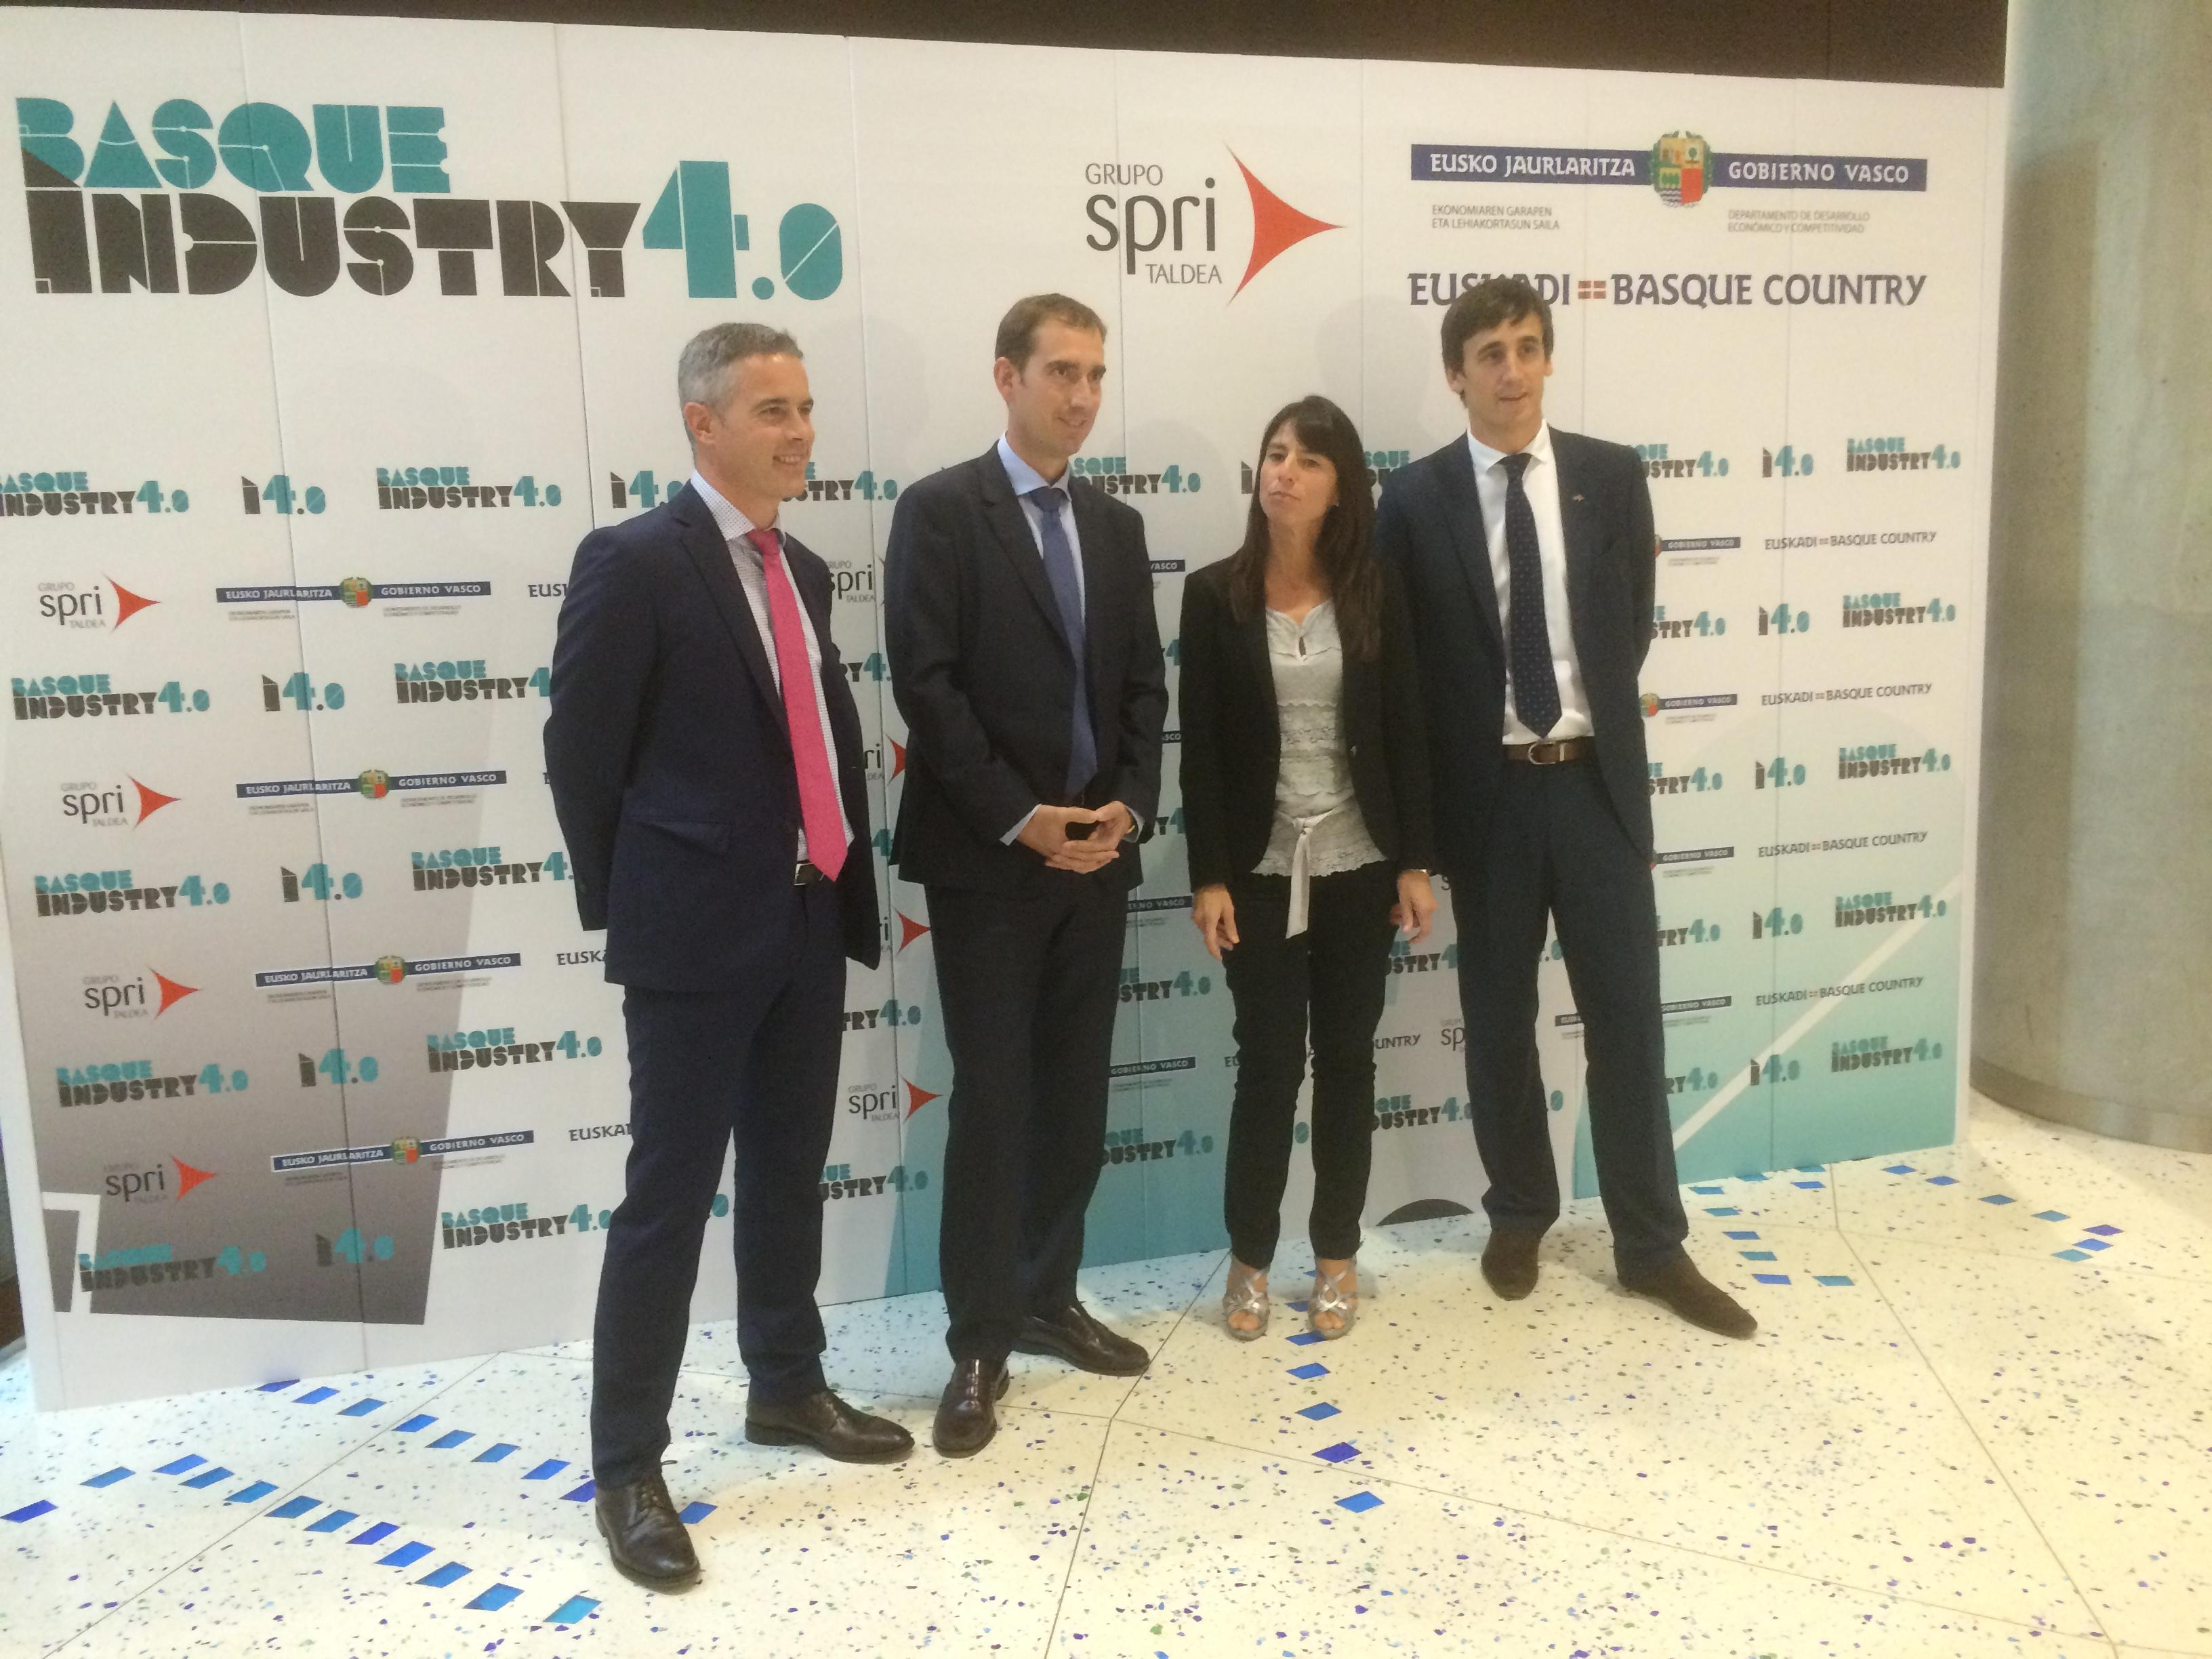 spri_innovacion_basque industry rueda prensa